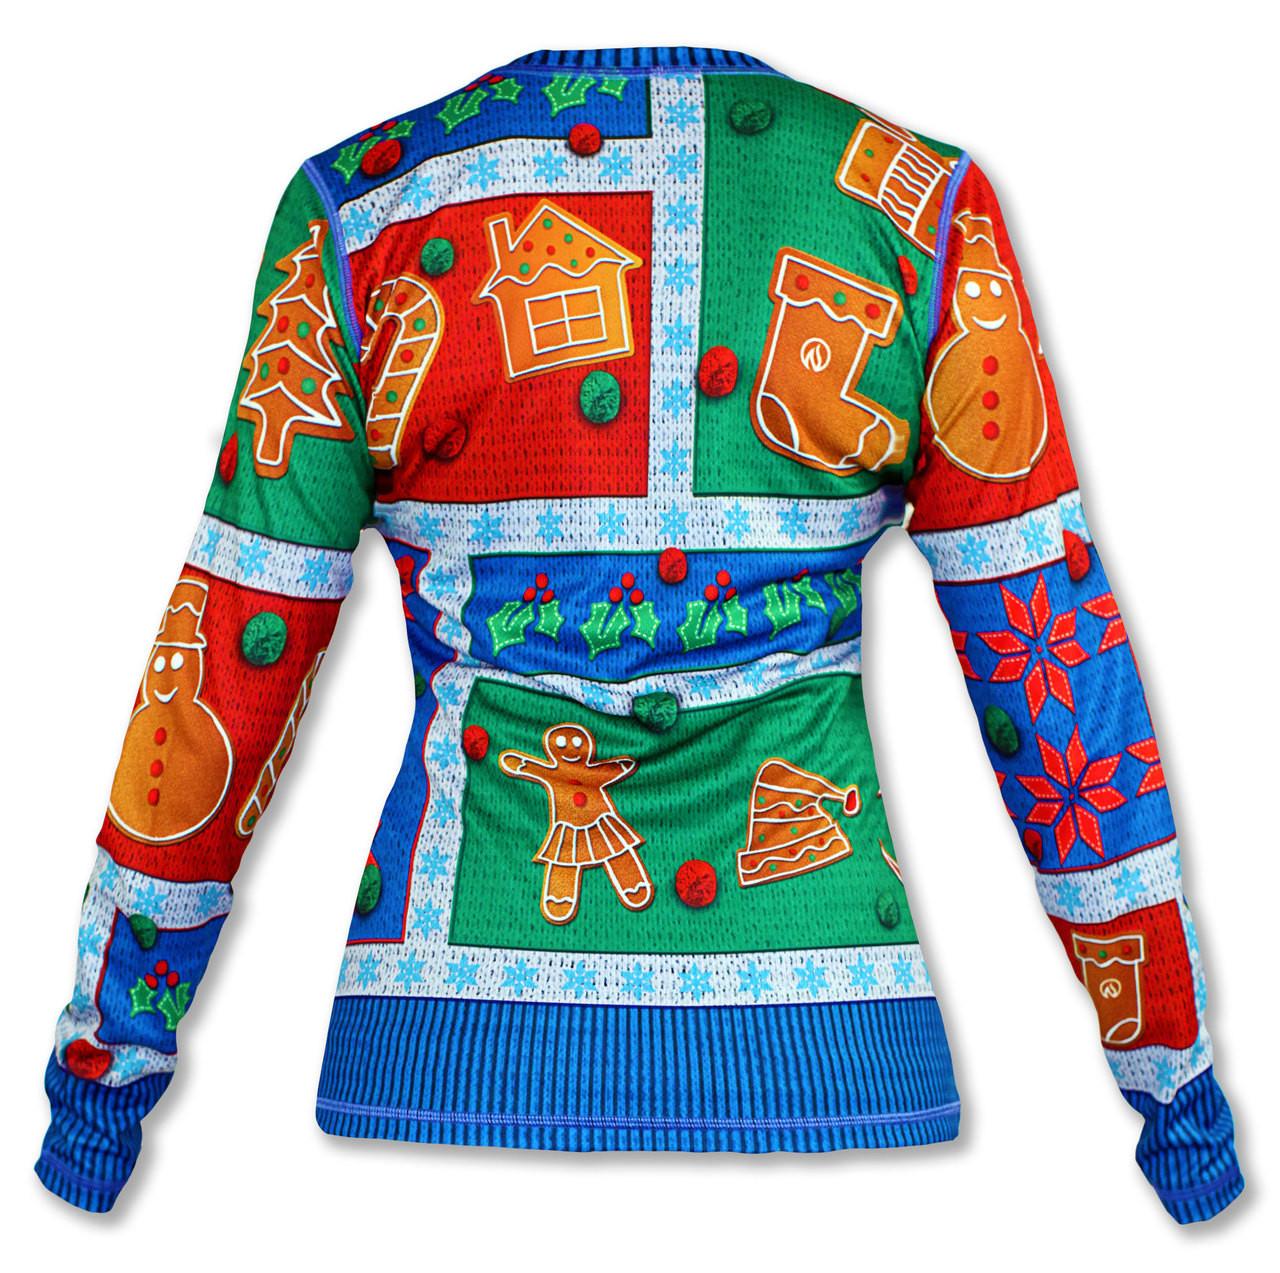 INKnBURN Women's 2017 Holiday Sweater Long Sleeve Tech Shirt Back